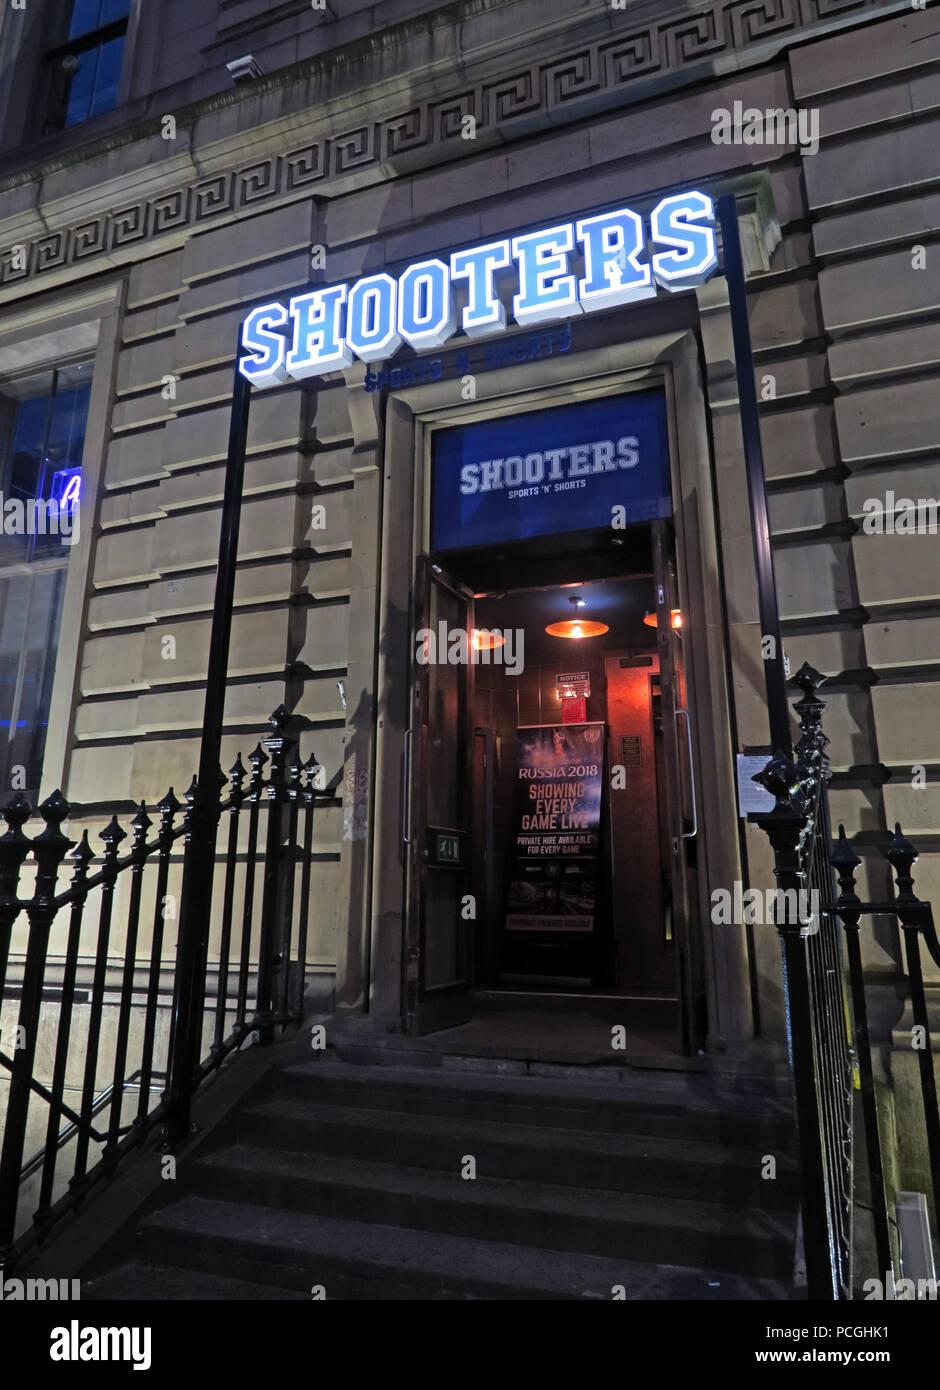 Laden Sie dieses Alamy Stockfoto Shooters Bar, Headrow, Zentrum der Stadt Leeds, West Yorkshire, England, LS1, UK - PCGHK1